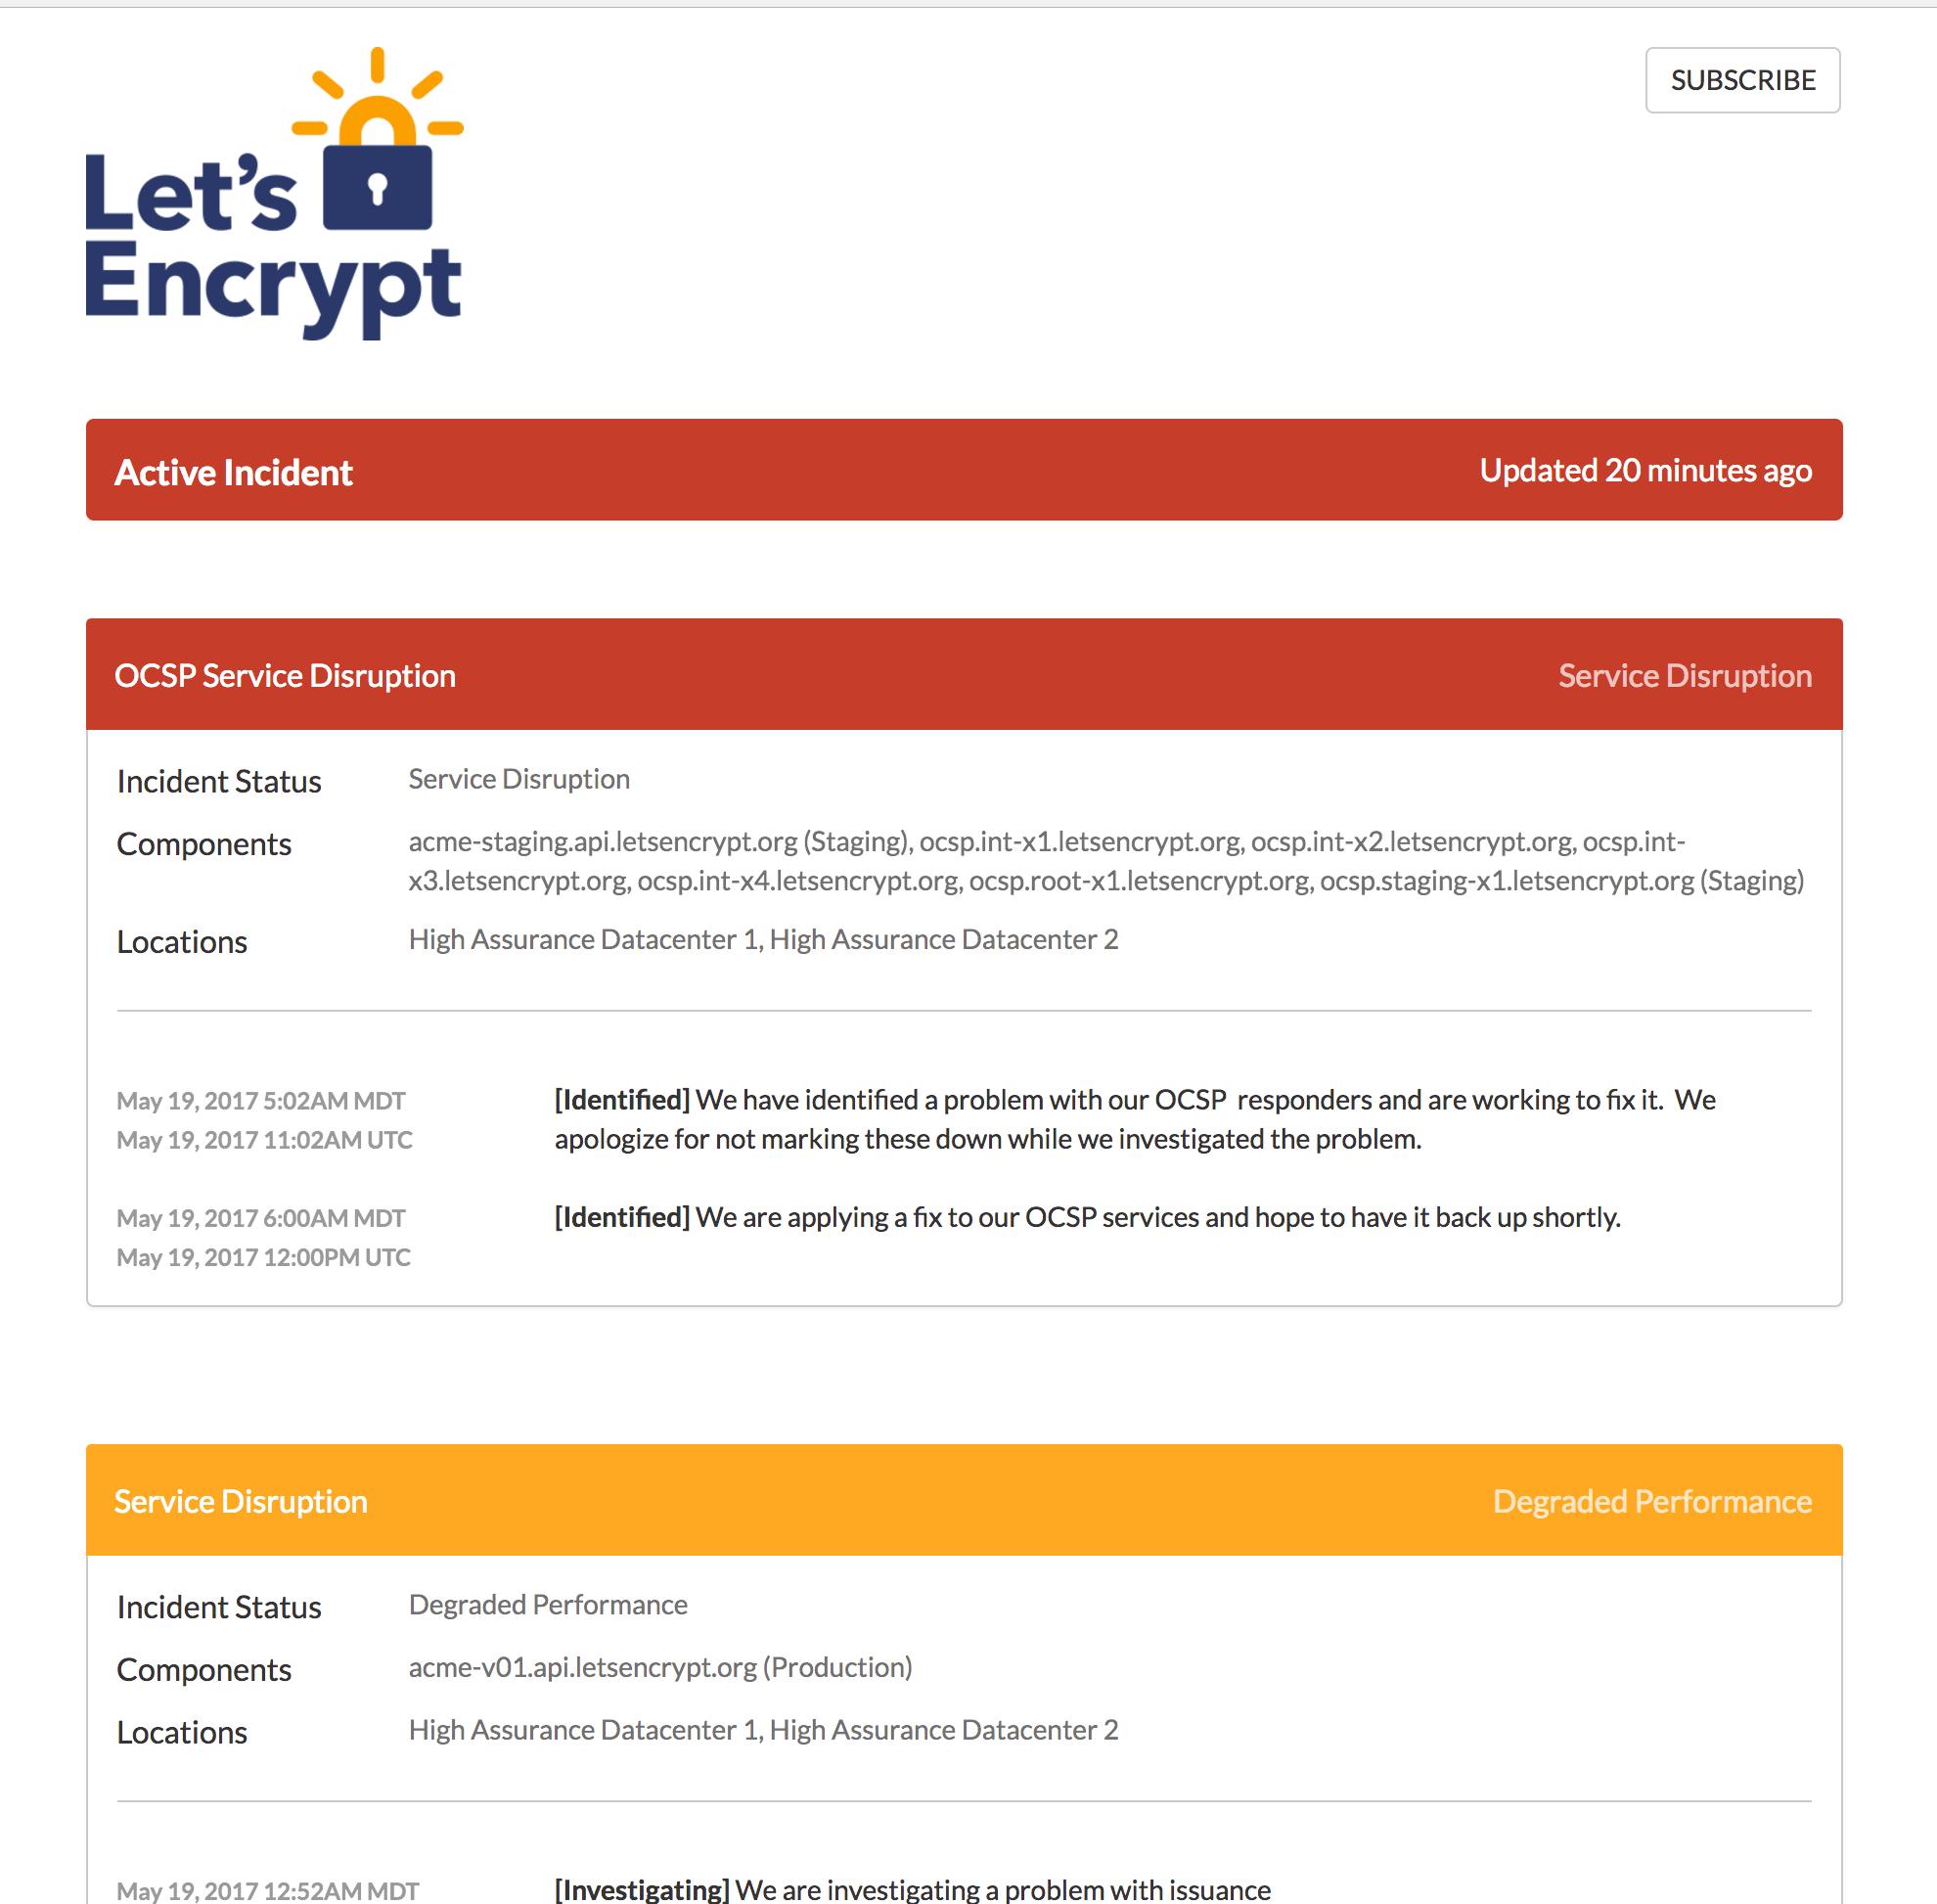 Let's Encrypt servers status